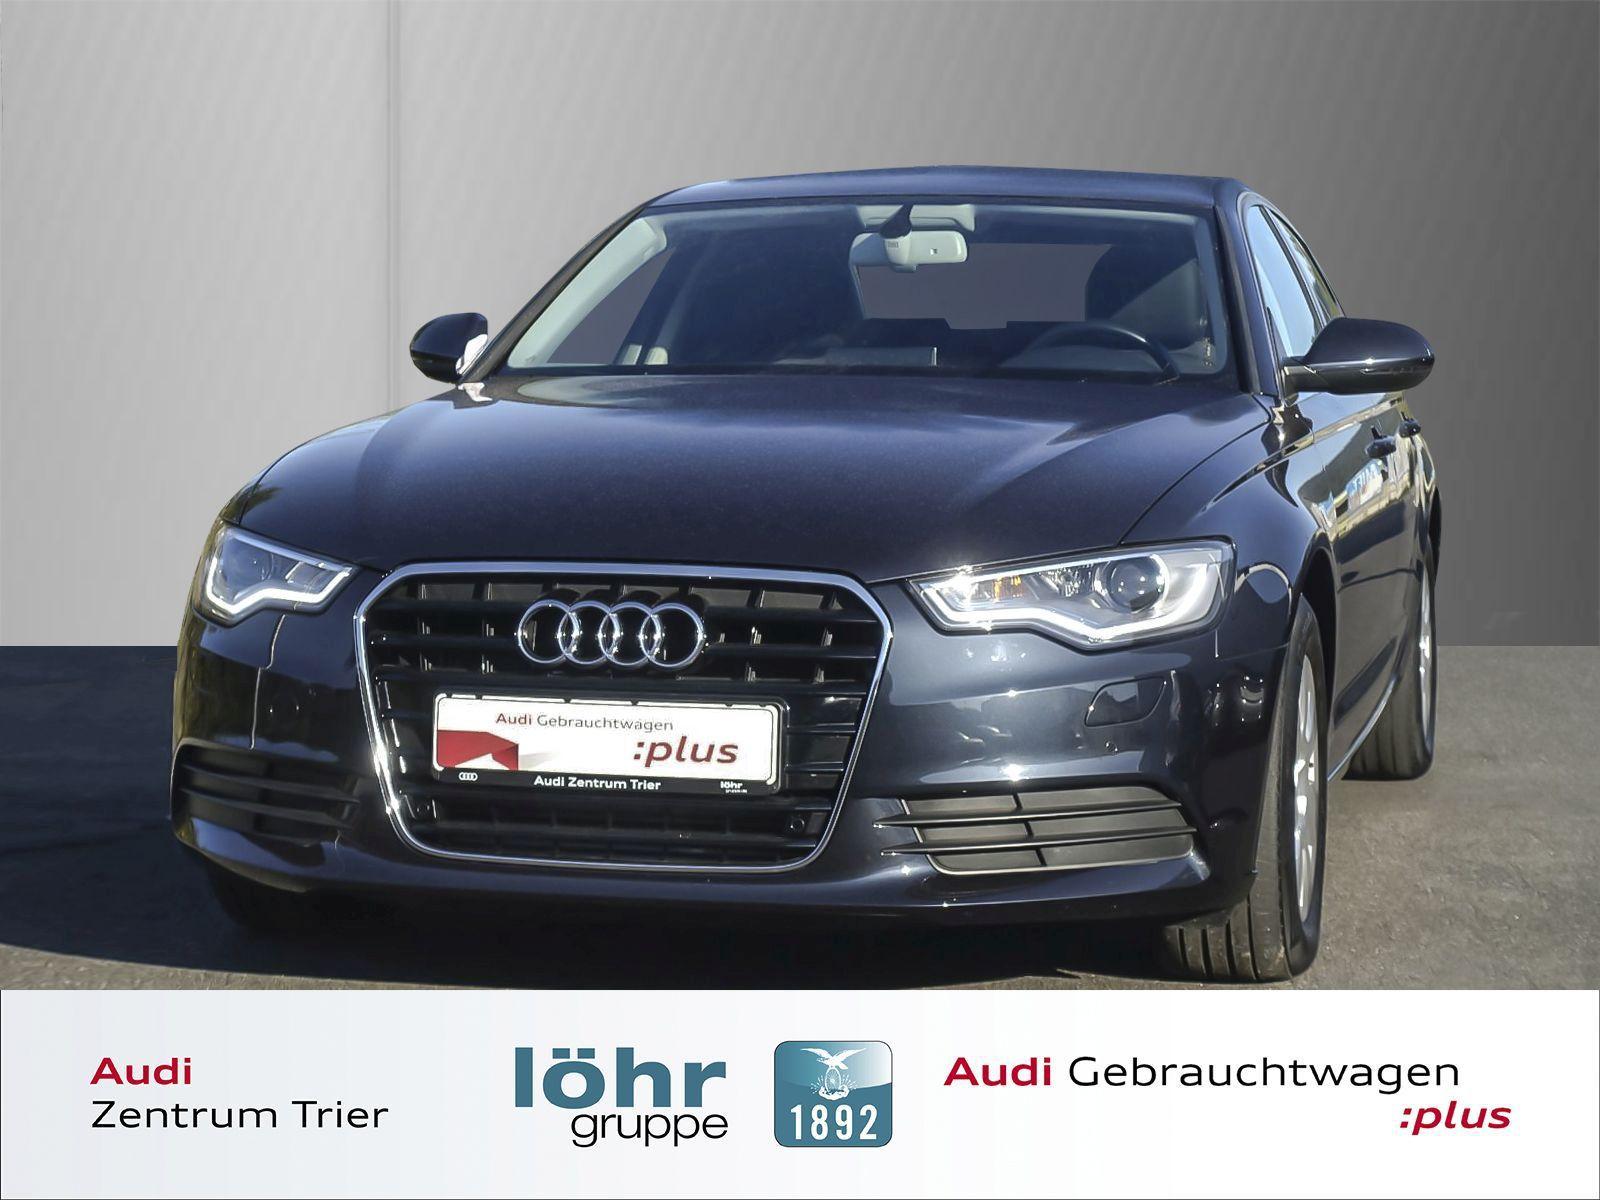 Audi A6 2.0 TDI Einparkhilfe/MMI NAVI plus/Xenon, Jahr 2014, diesel